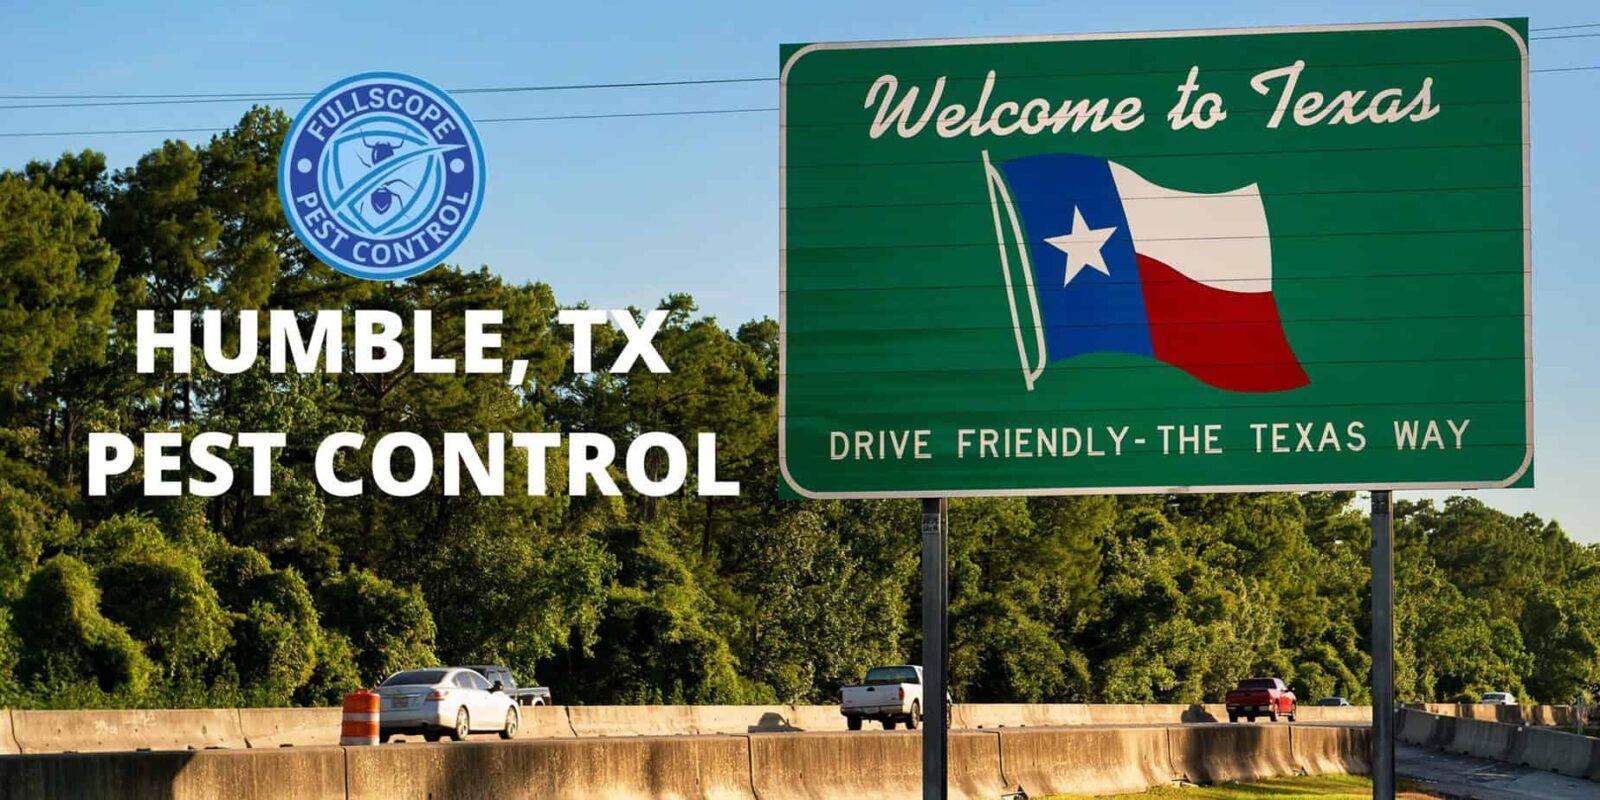 Humble Texas Pest Control FullScope